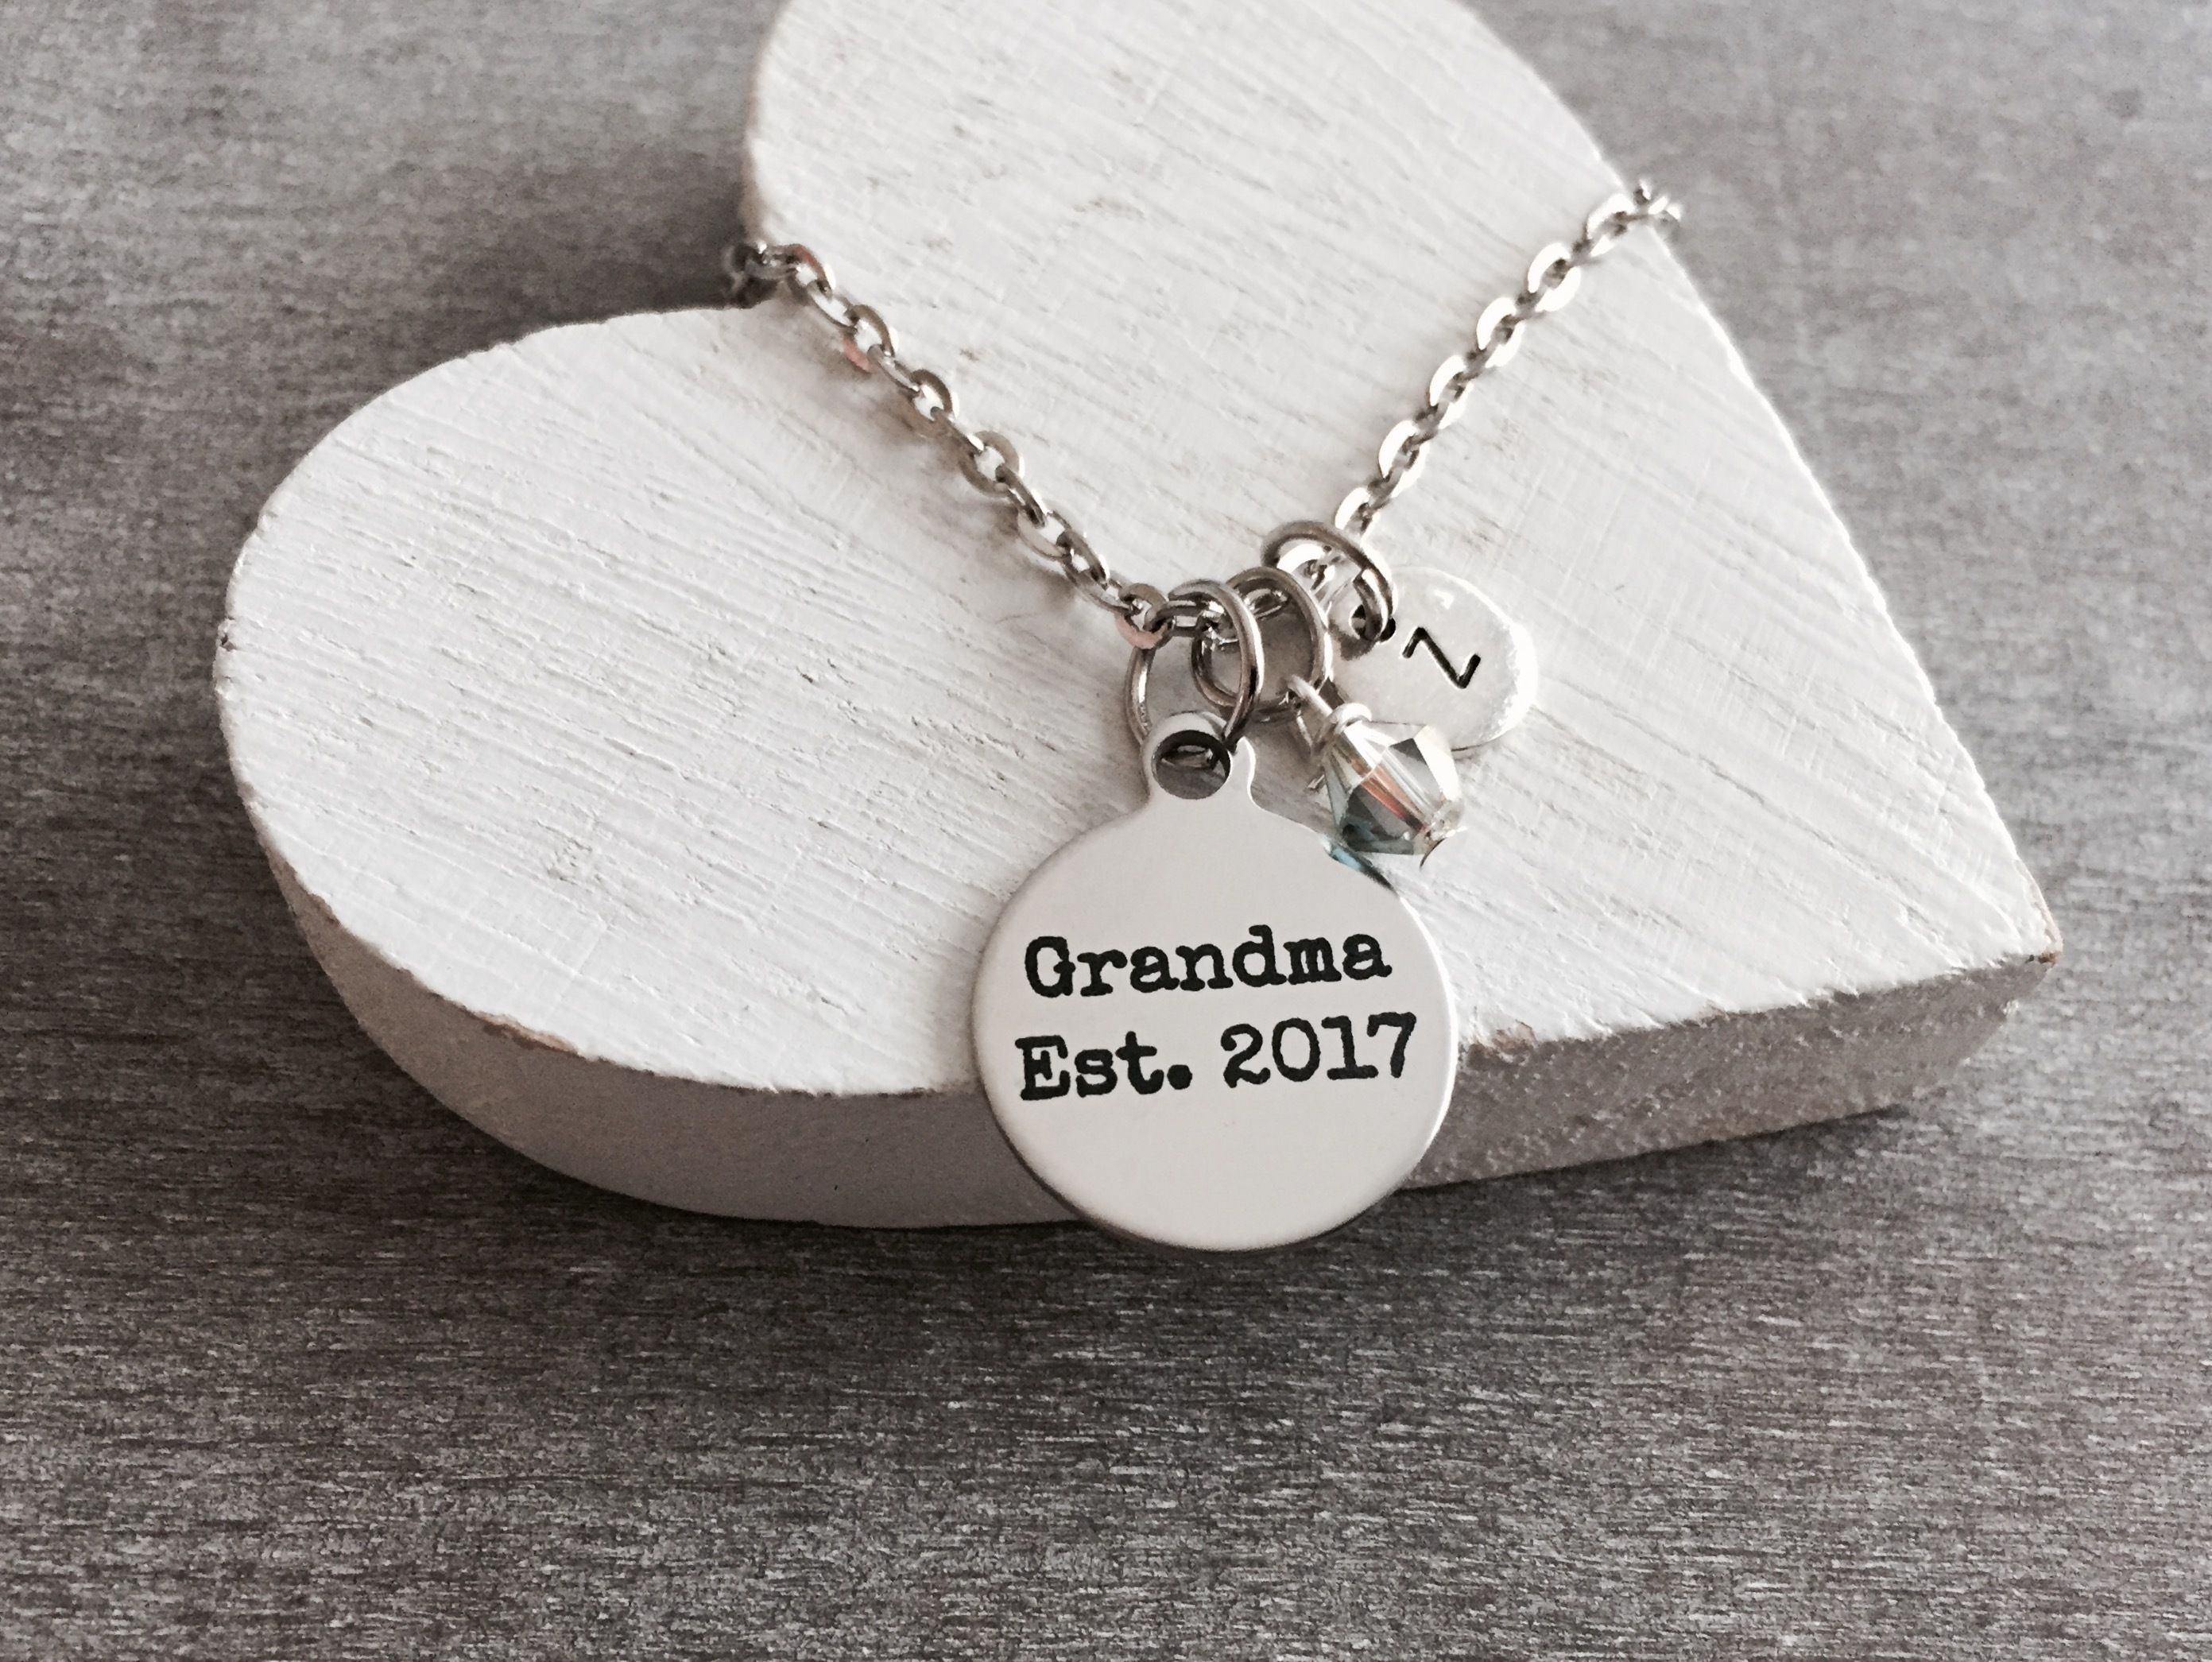 Grandma est 2017 silver necklace grandma necklace grandma gift grandma est 2017 silver necklace grandma necklace grandma gift grandma pendant aloadofball Image collections